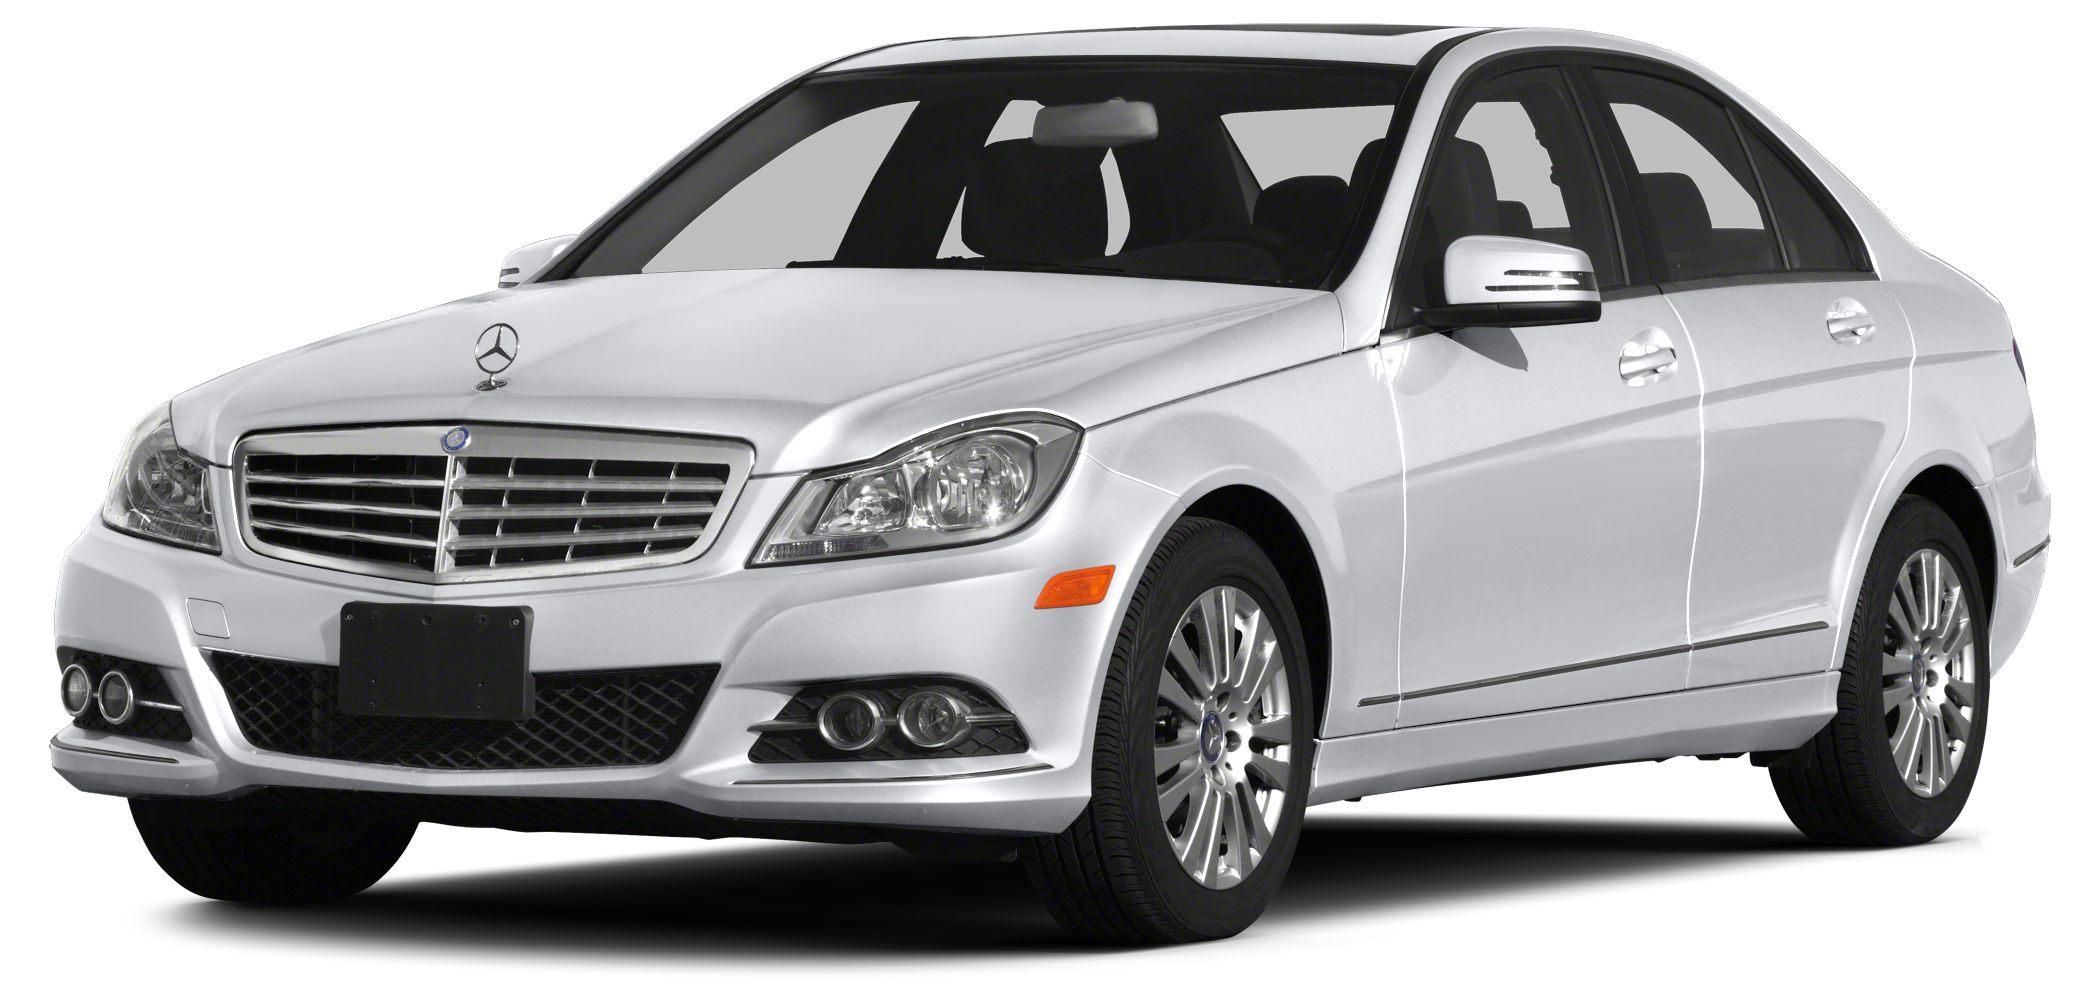 2013 MERCEDES C-Class C250 Luxury Miles 56345Color Polar White Stock 744758 VIN WDDGF4HB7DA7